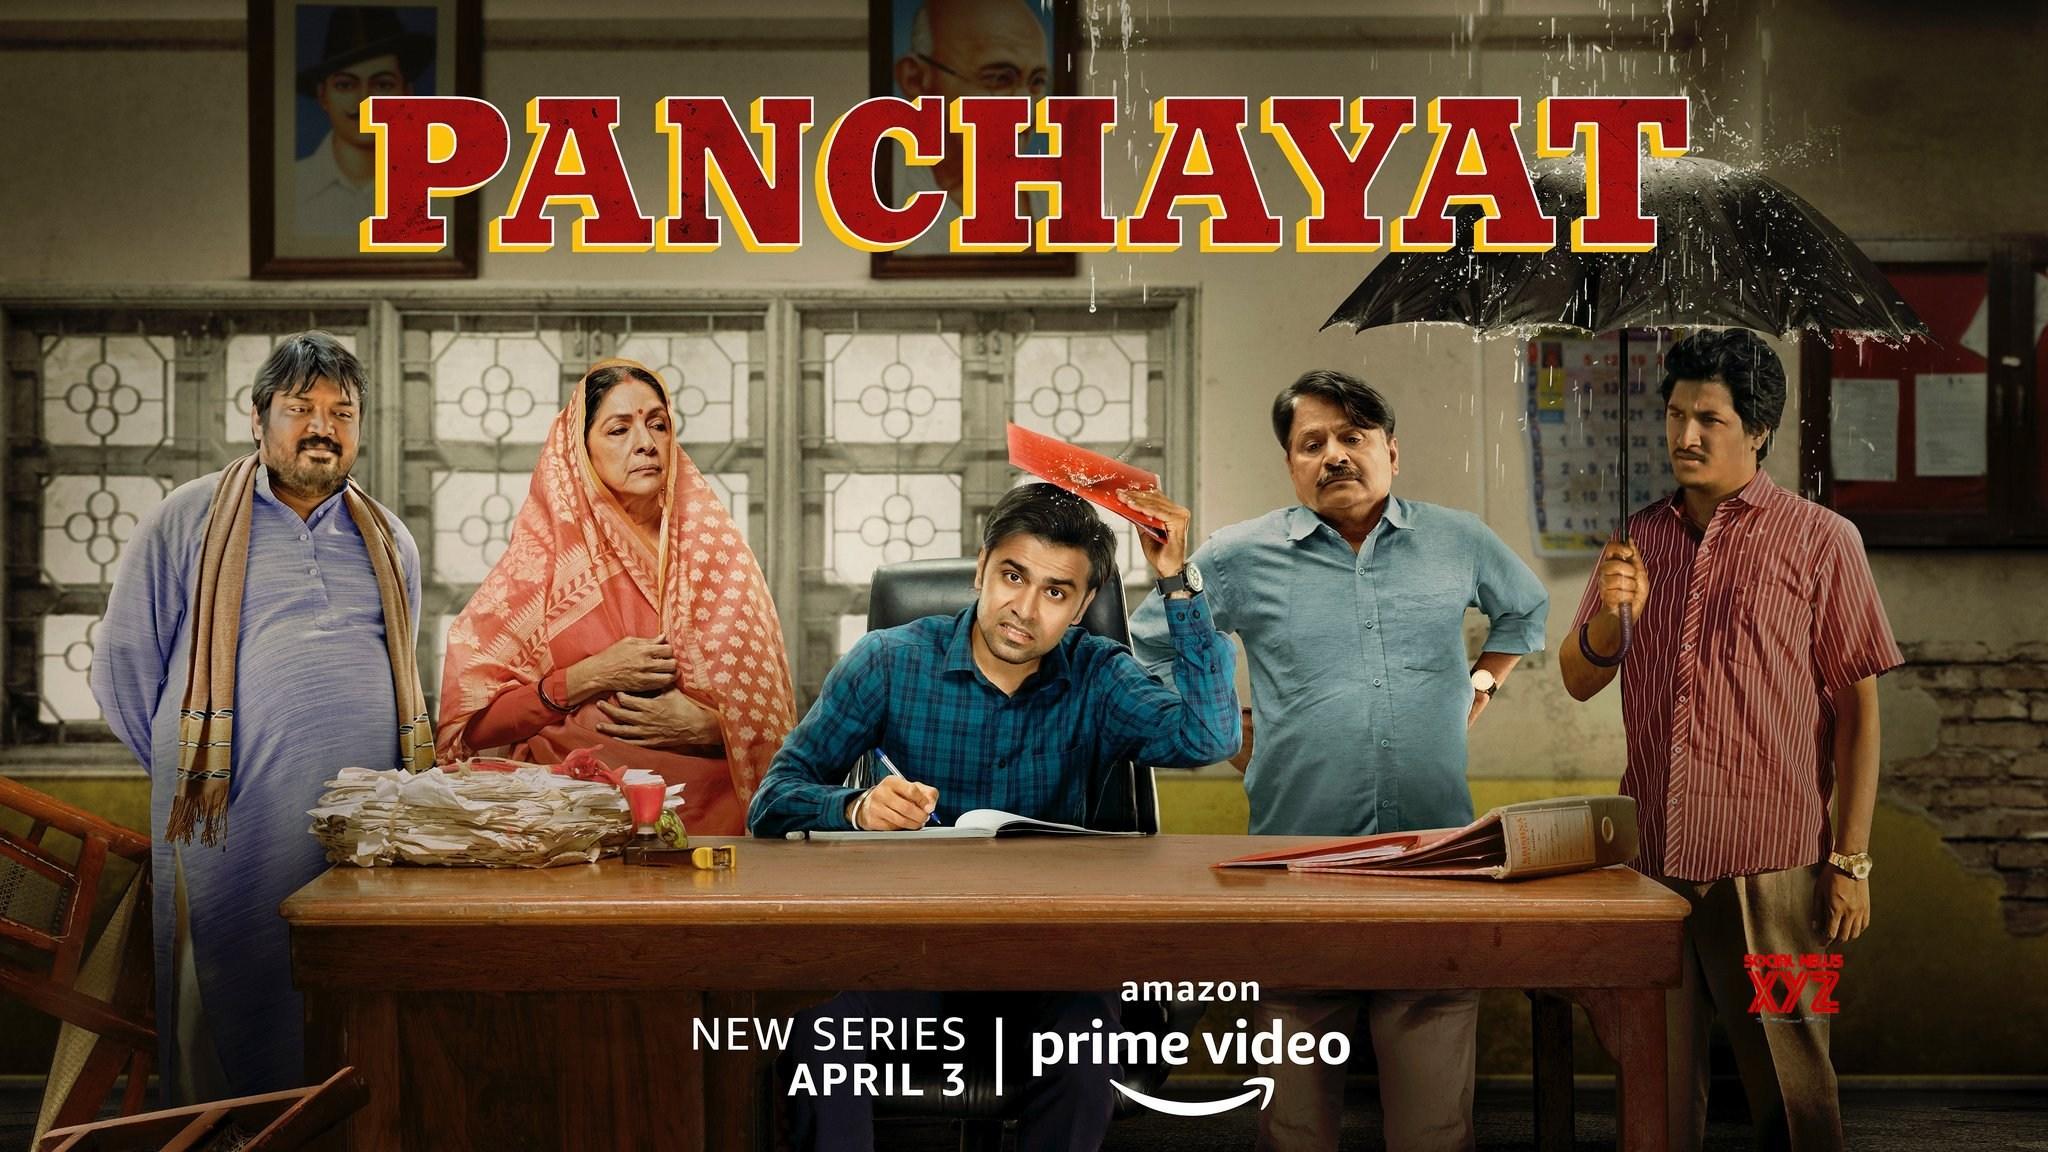 Panchayat Review Prime Video A Lock Down Time Pass Rating 2048x1152